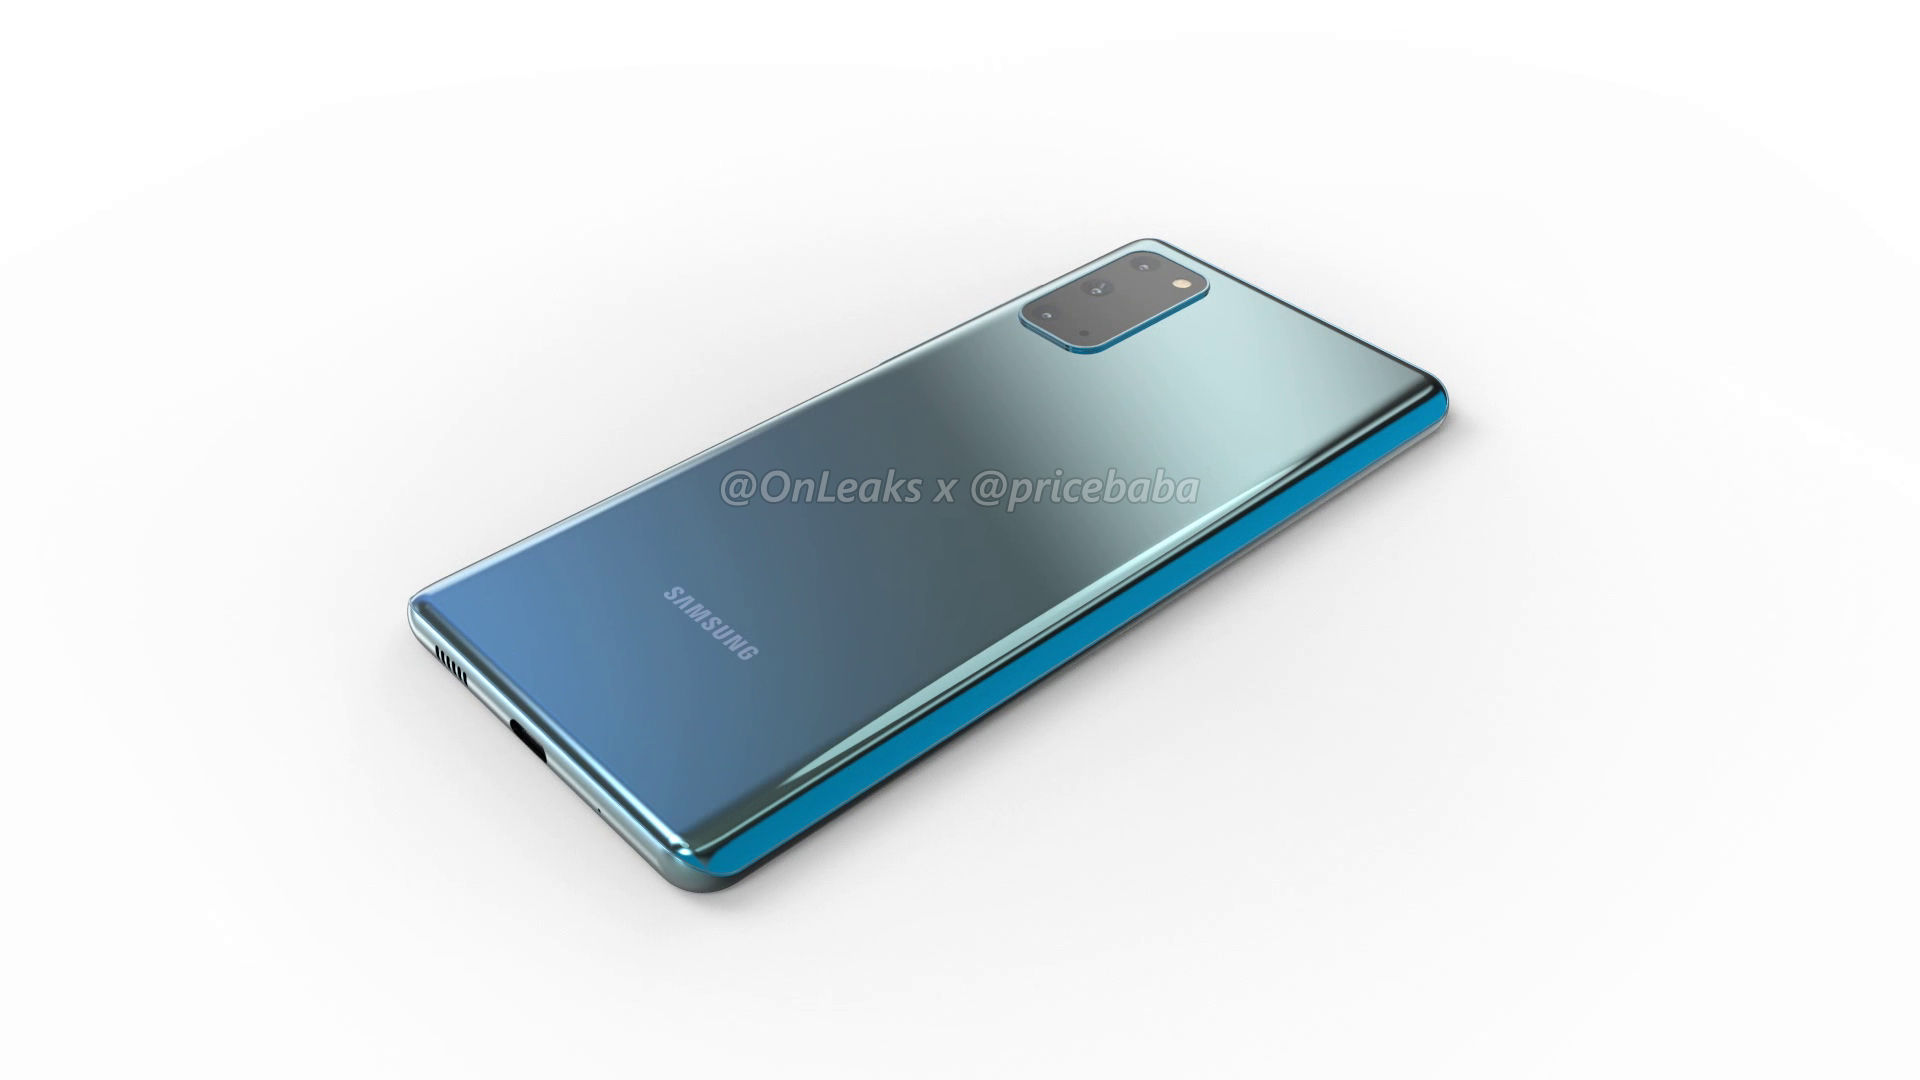 Samsung Galaxy S20 Fan Edition renders